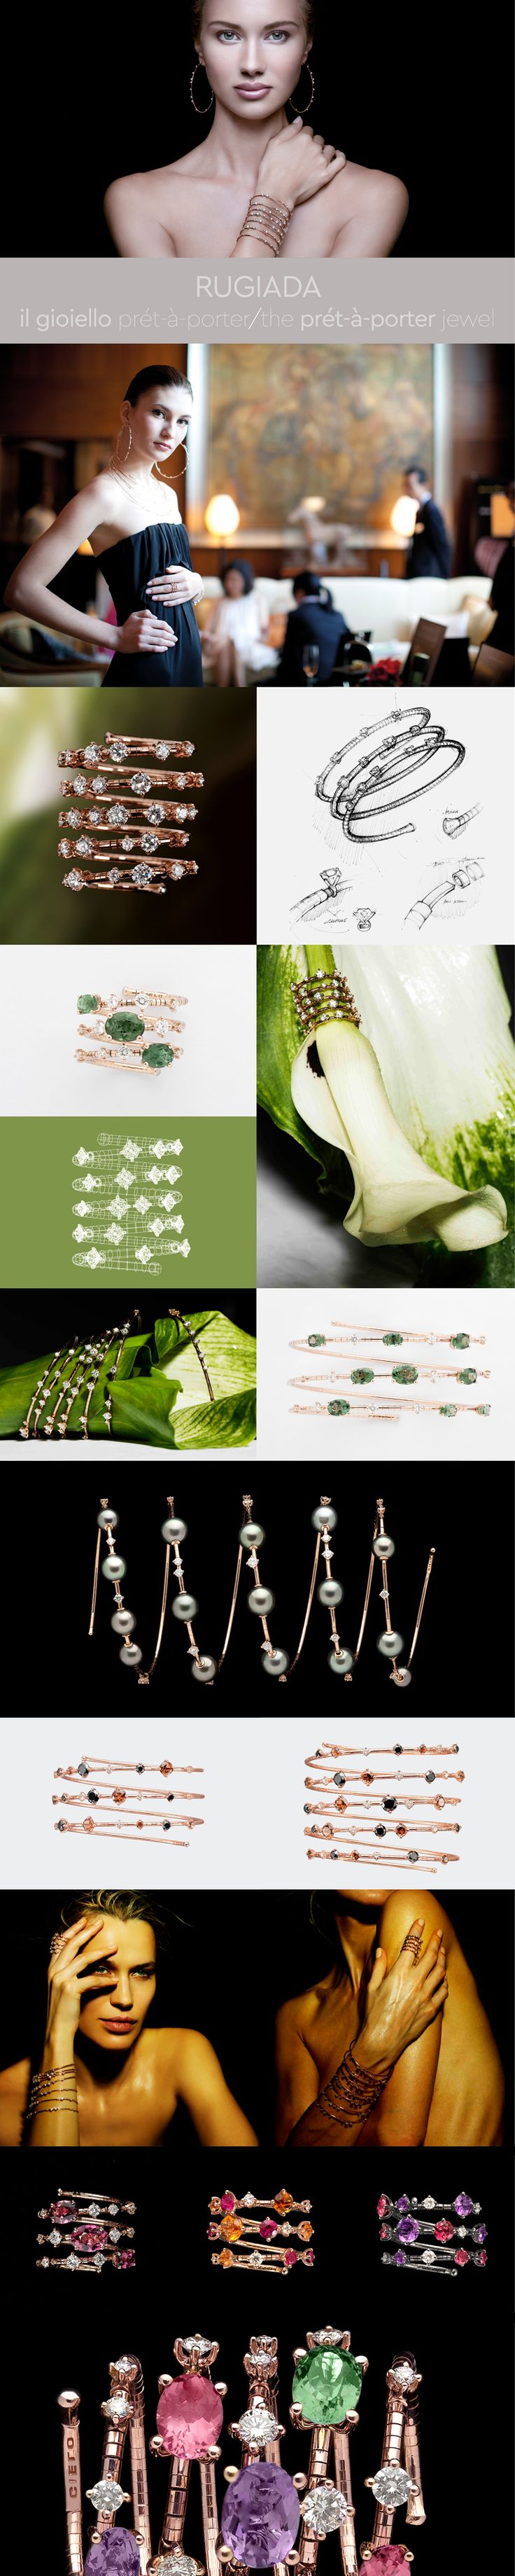 Massimiliano Bonoli - Project Jewelry